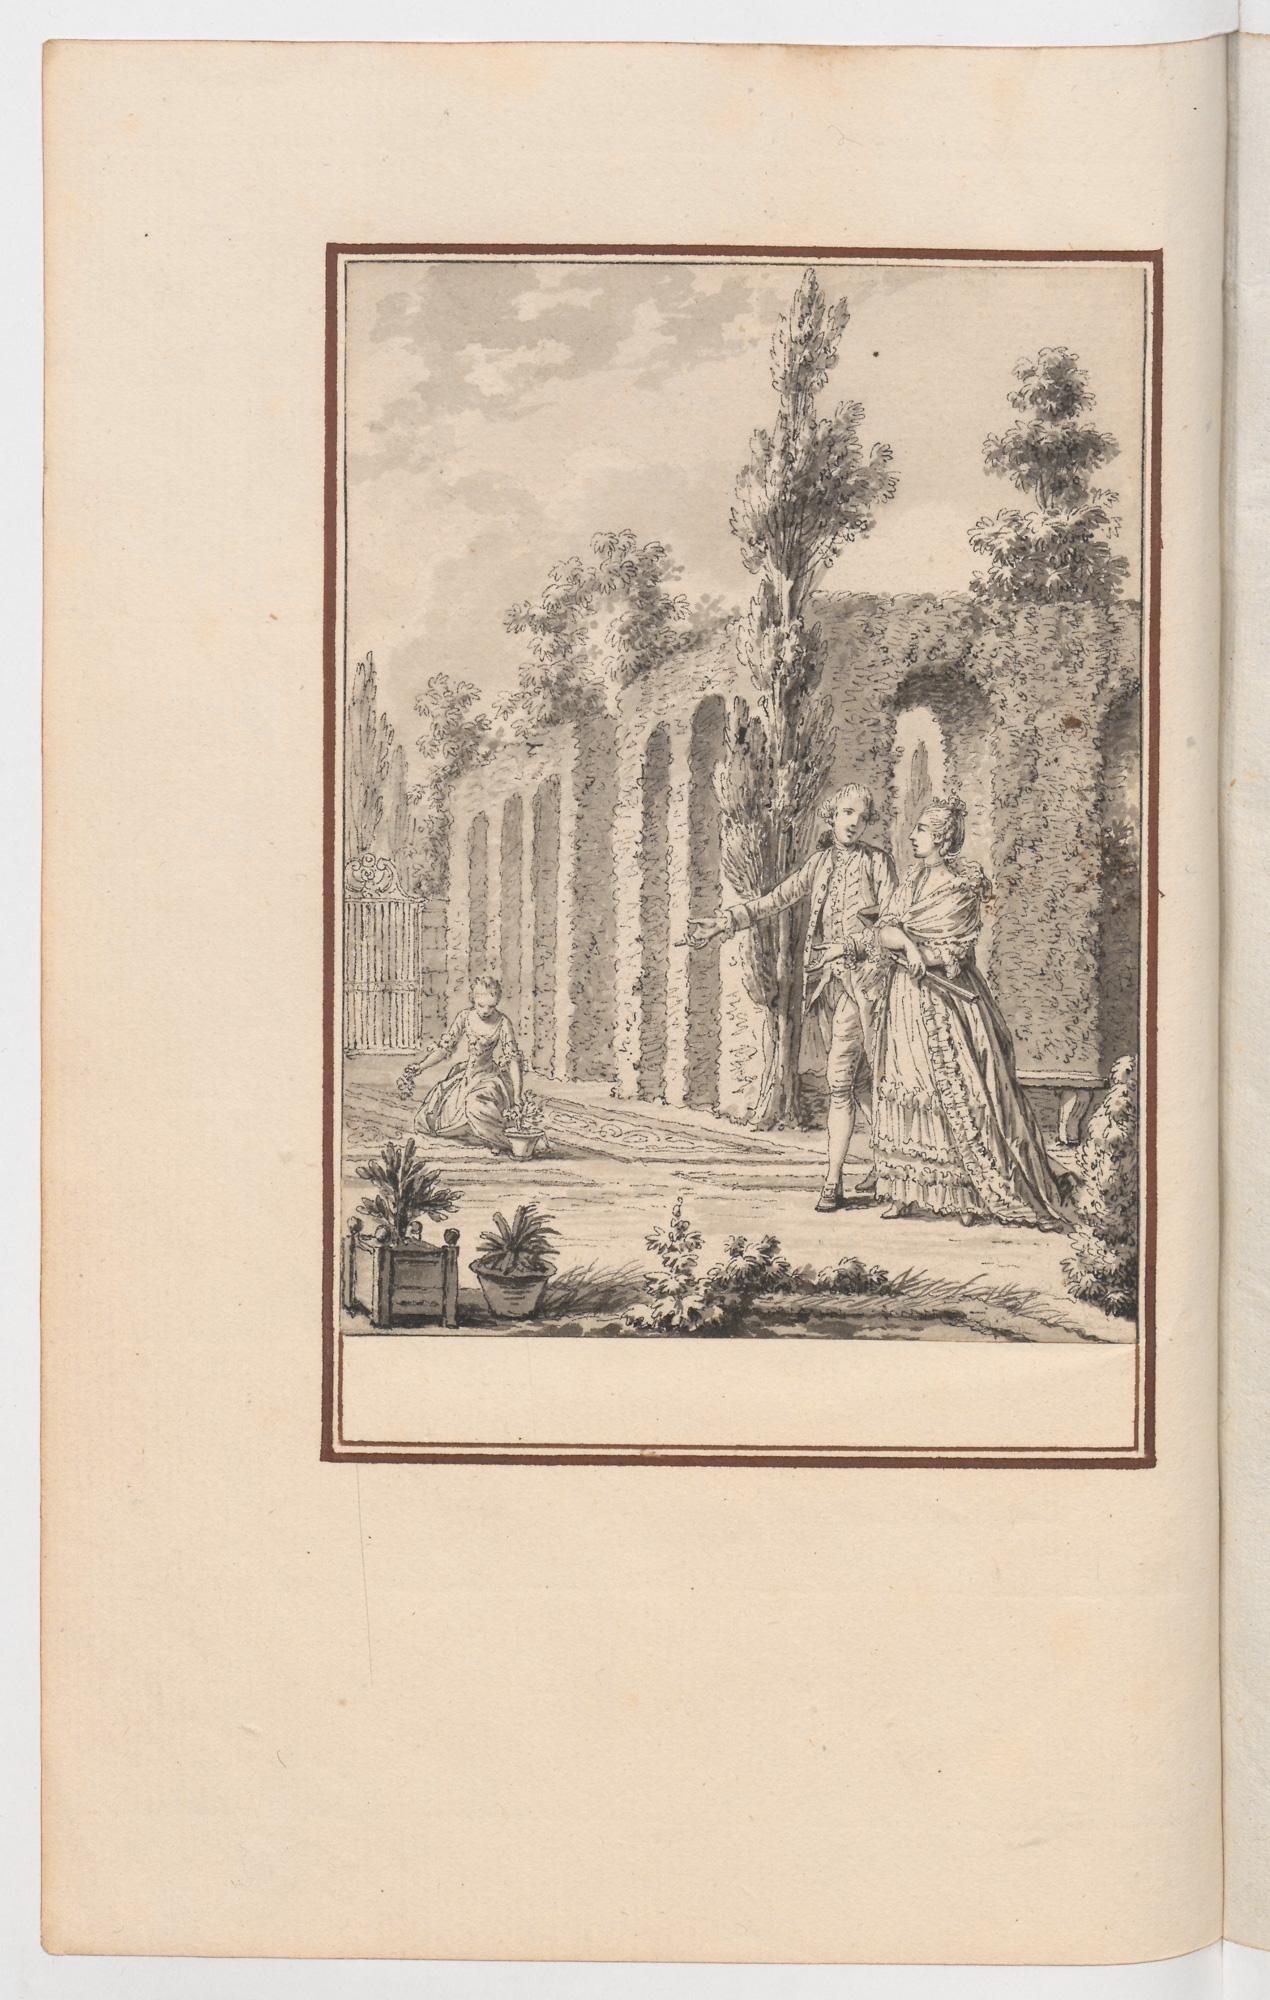 S.4.02 La consolation, Chantilly, Image